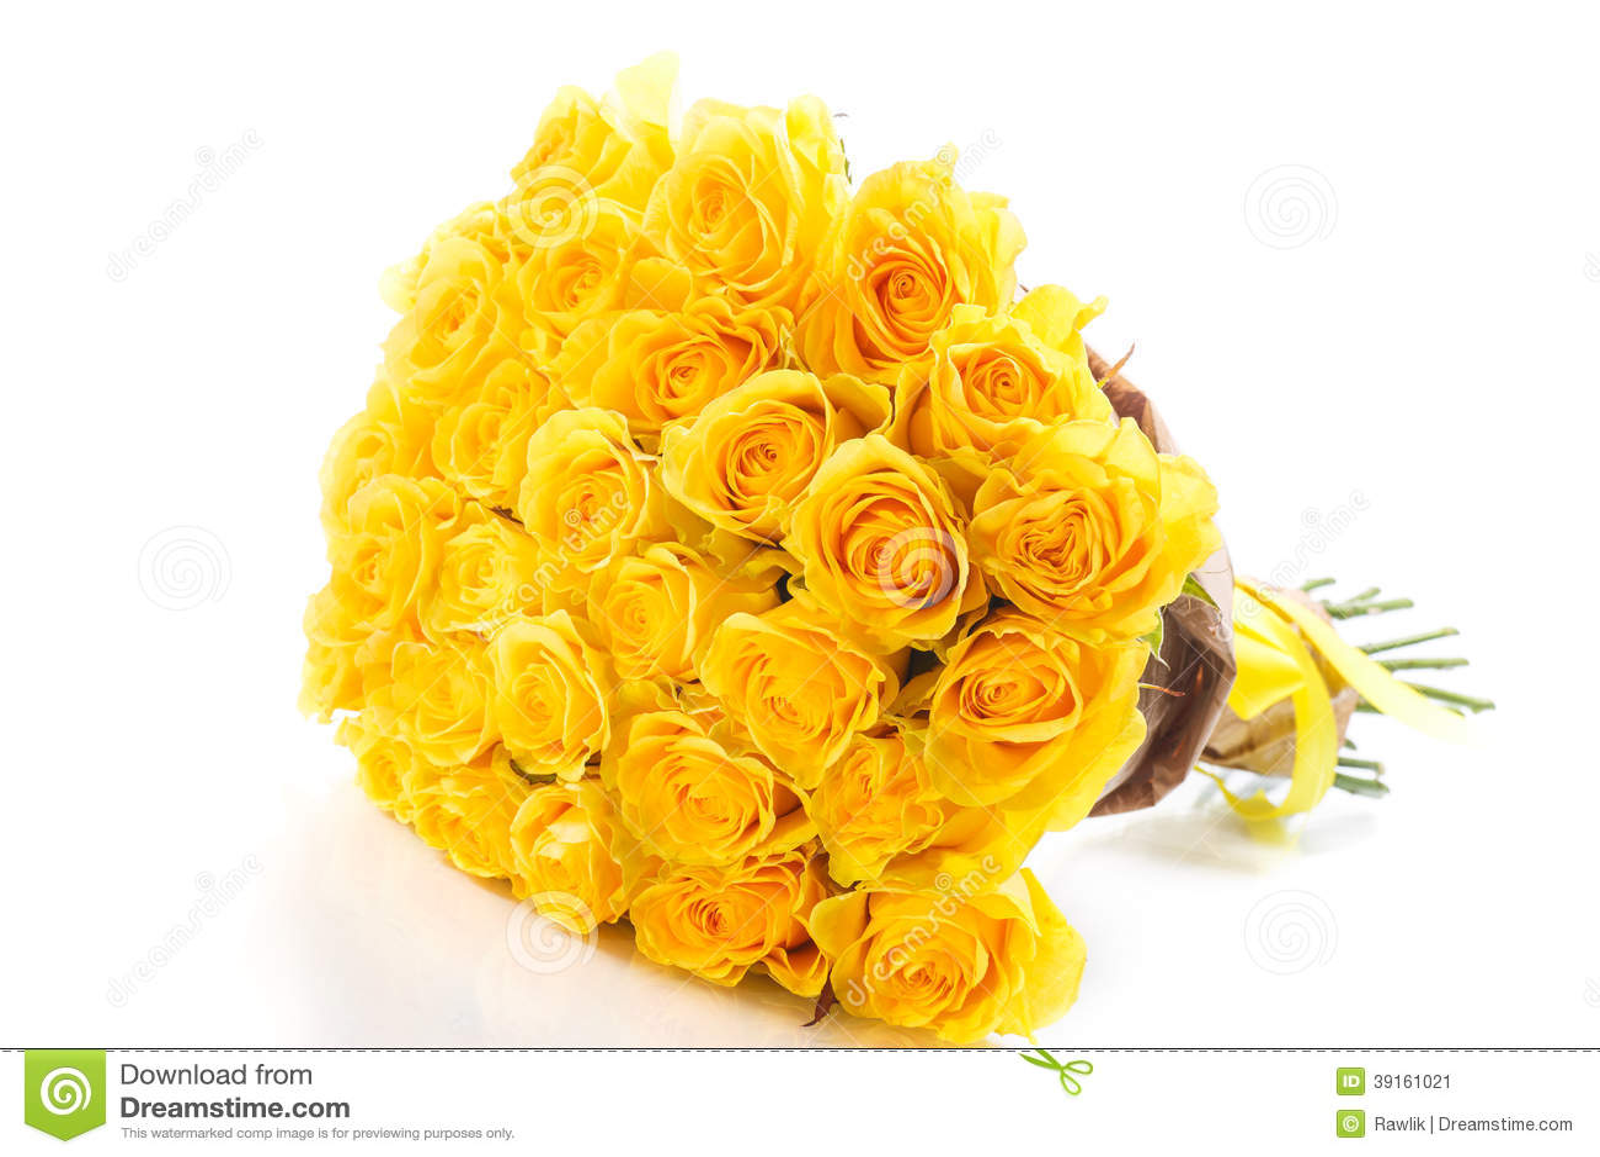 Yellow Roses Isolated On White Background Stock Image Image Of